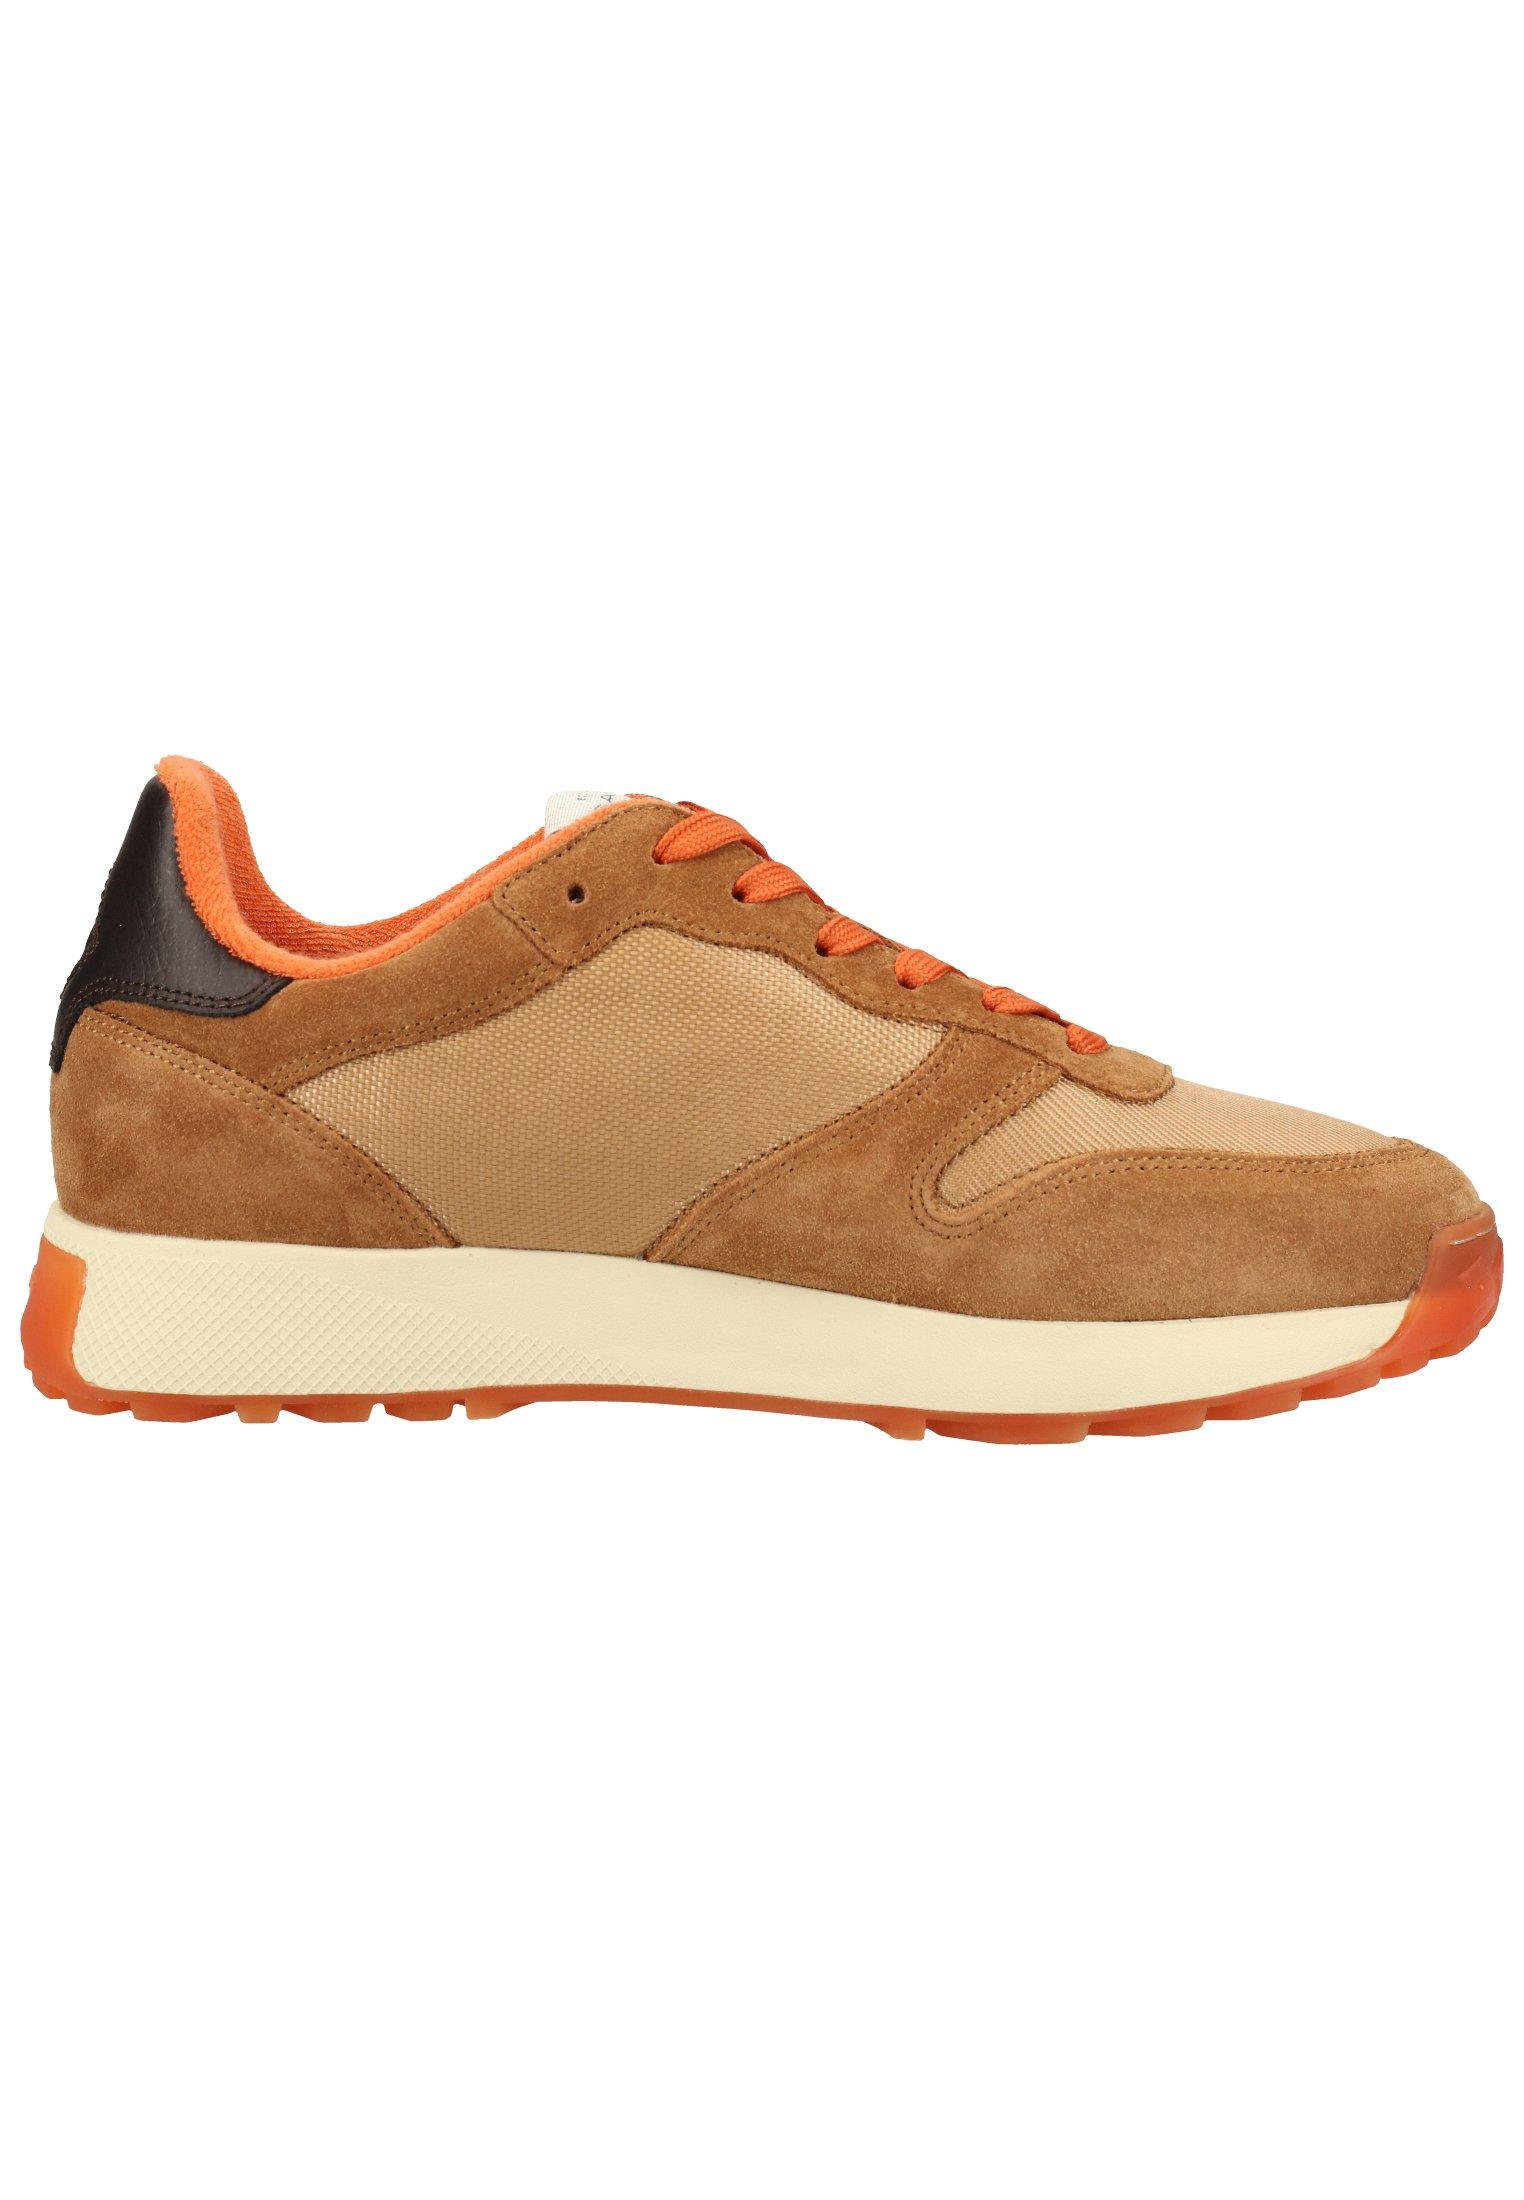 GANT Sneaker low - tobacco brown g/braun - Herrenschuhe mDtEN